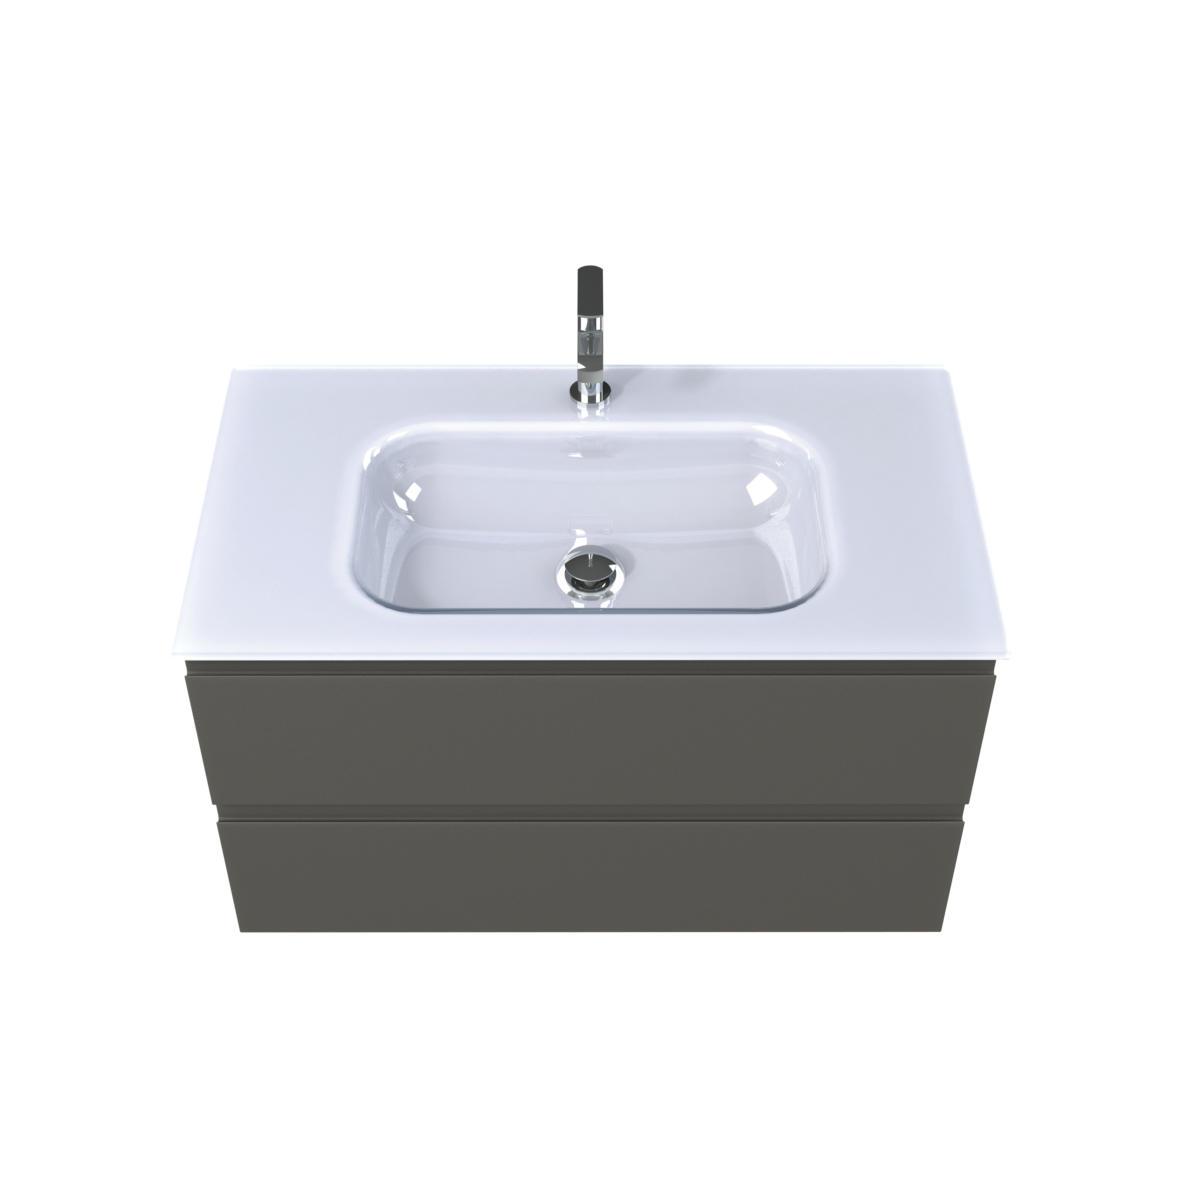 Plan vasque verre blanc brillant